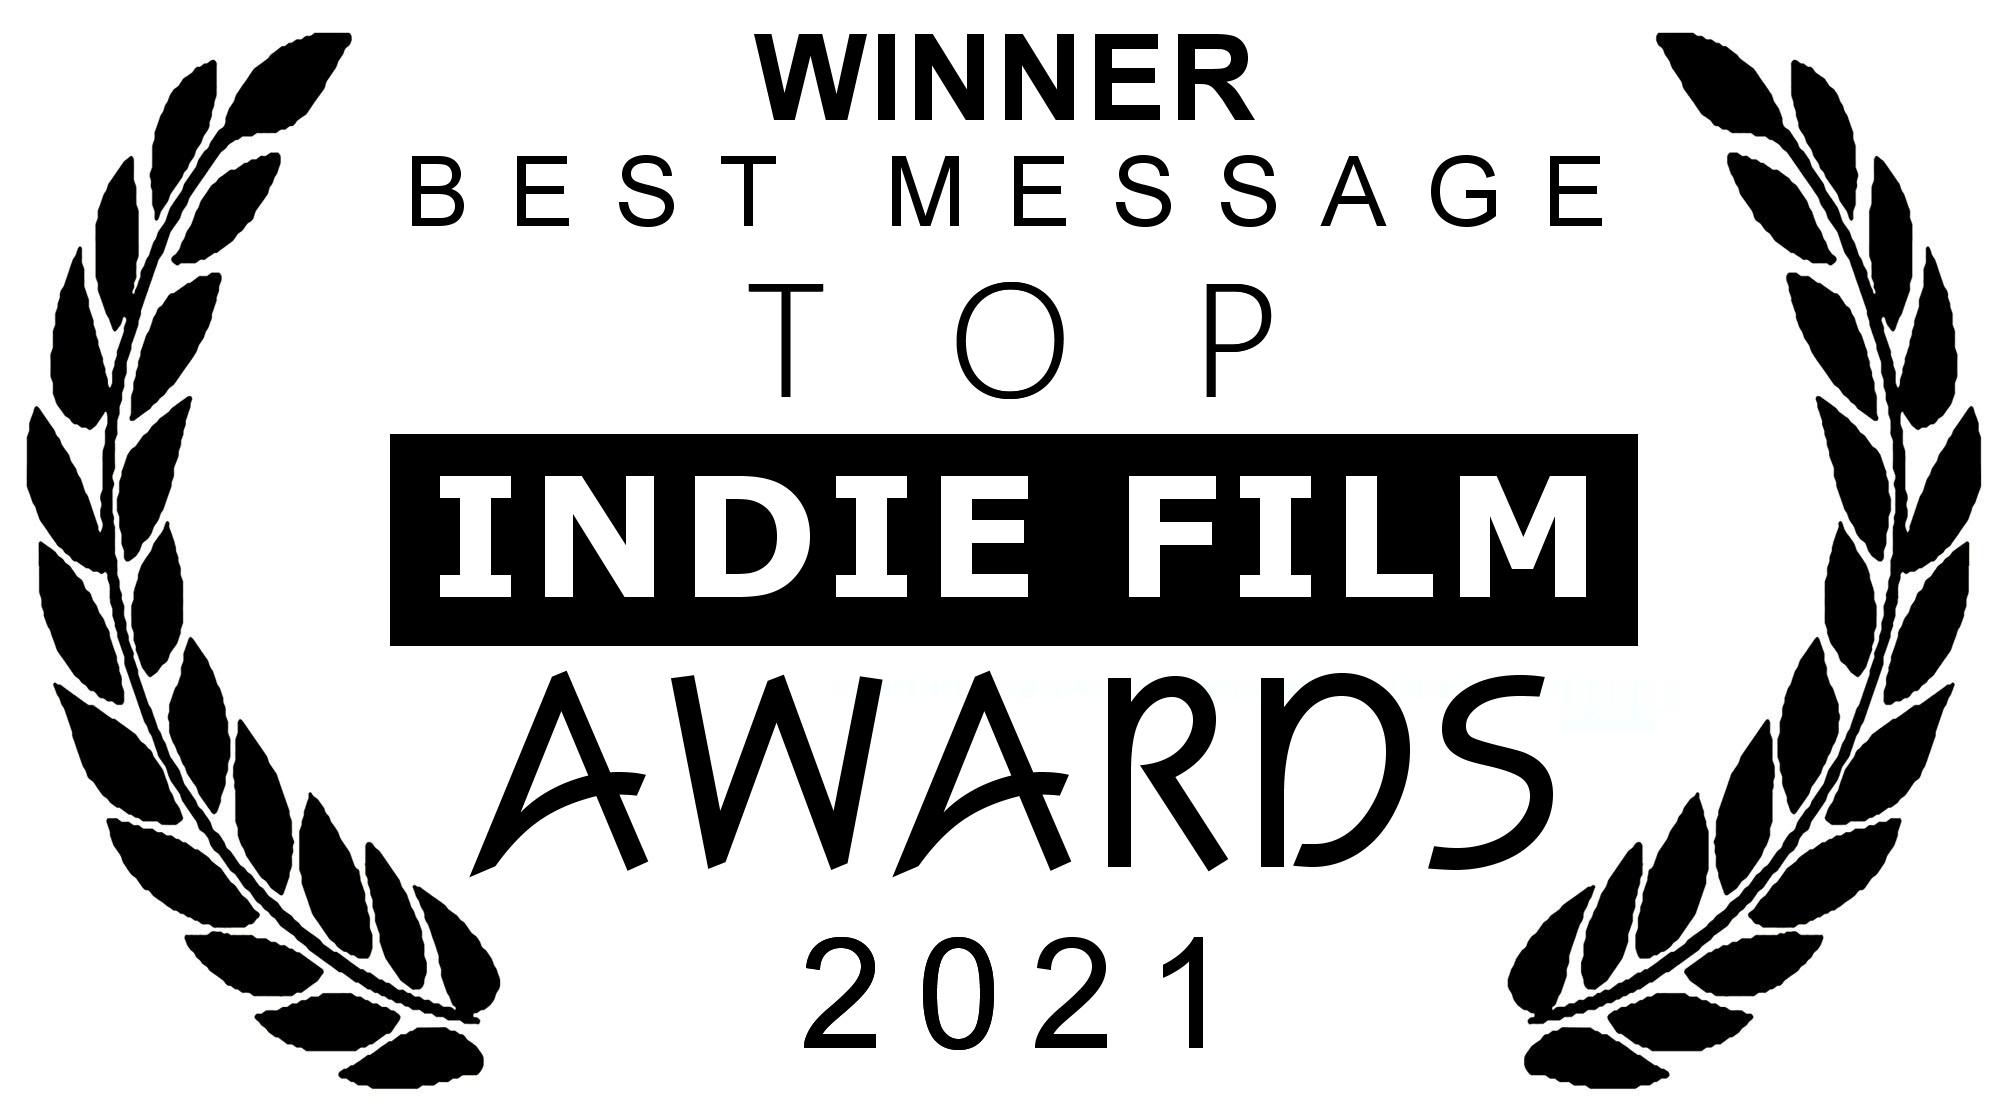 Winner - Top Indie Film Awards (Best Message)